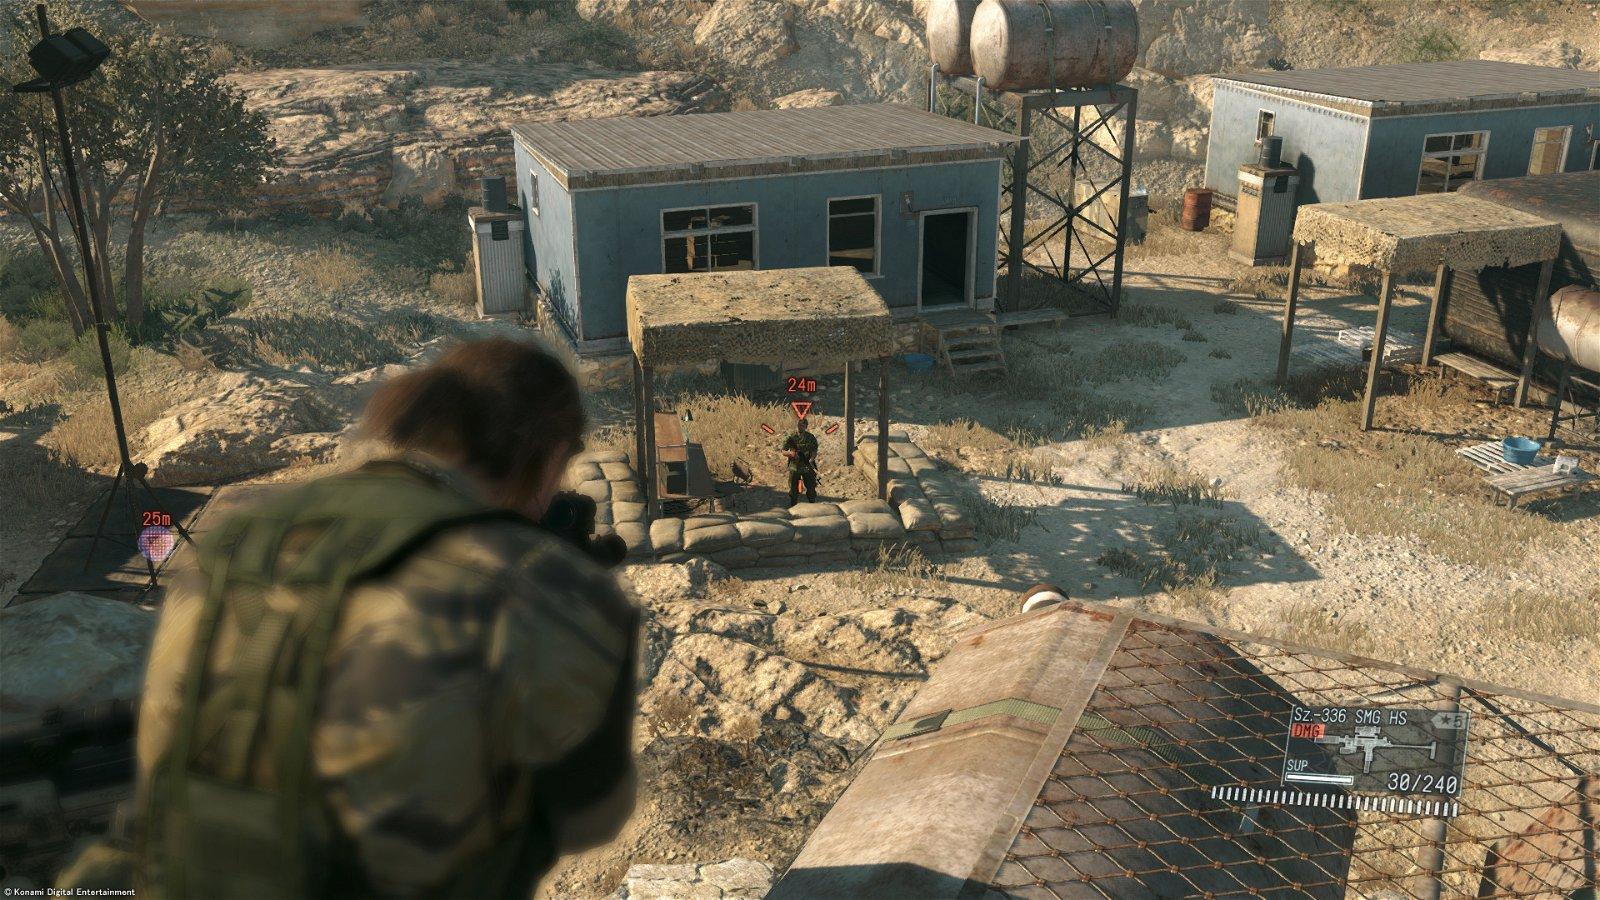 Metal Gear Solid V: The Phantom Pain Preview: Secretive Brilliance 2